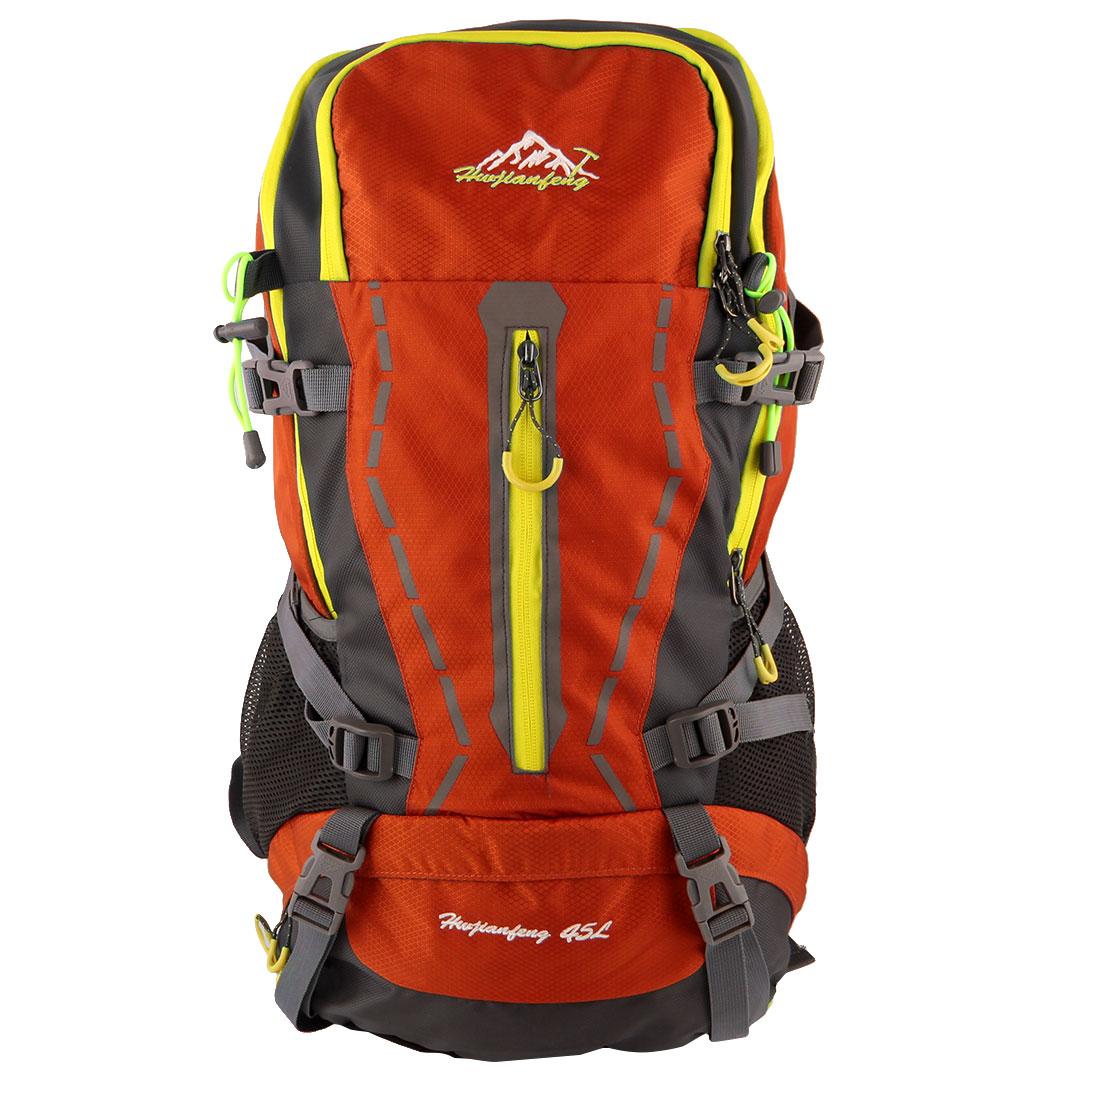 HWJIANFENG Authorized Trekking Climbing Pack Backpack Sports Bag Orange